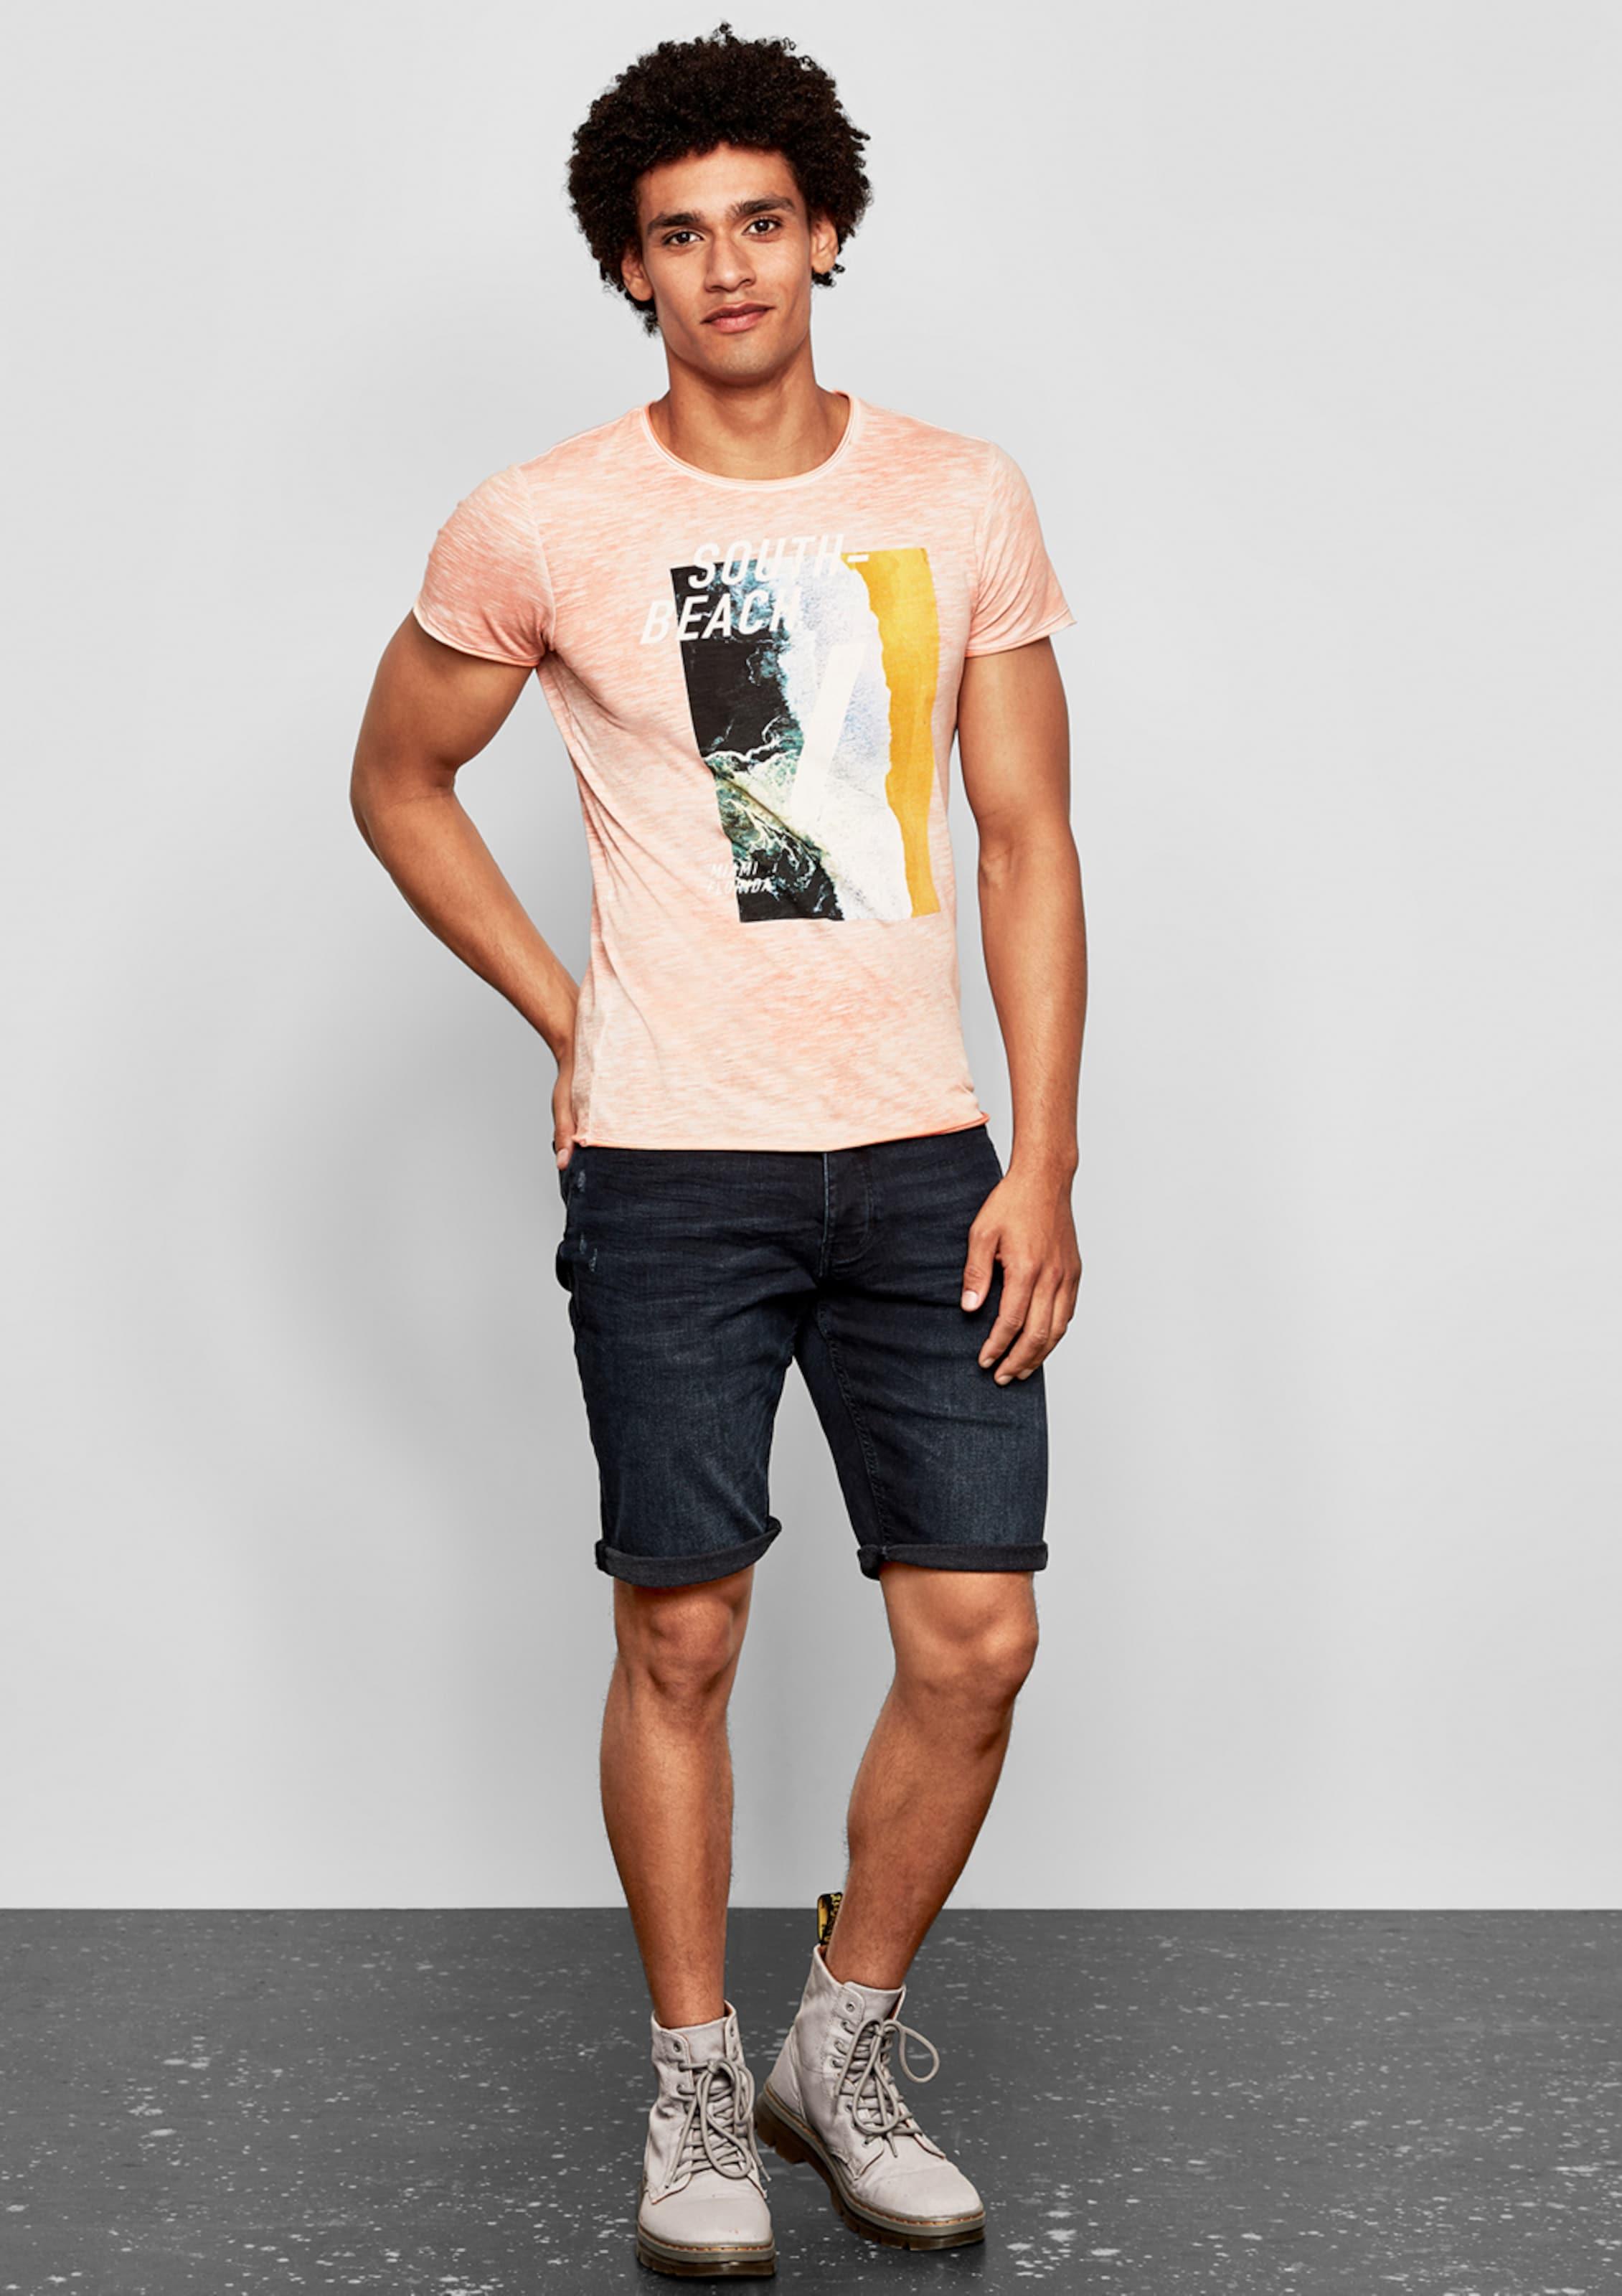 s Shirt GoldgelbPetrol Lachs Designed In Weiß Q By tdChsrQ